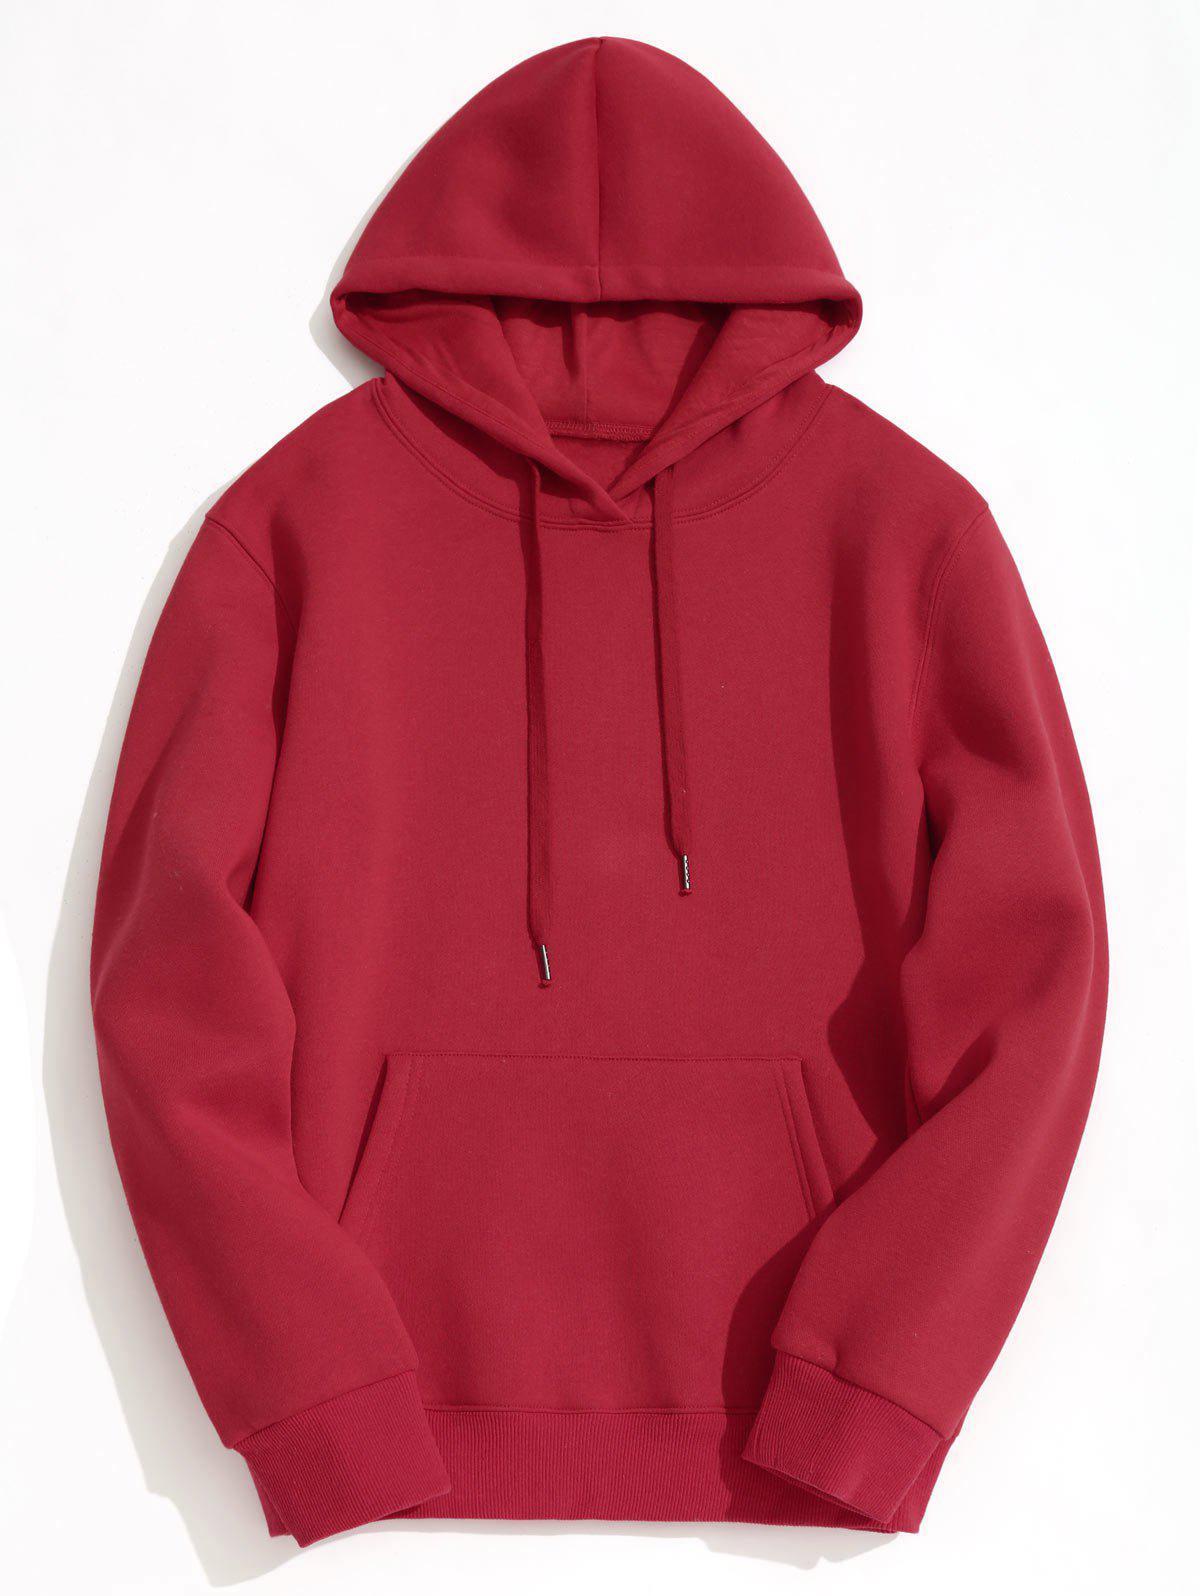 Fleece Lining Kangaroo Pocket Hoodie 239159001